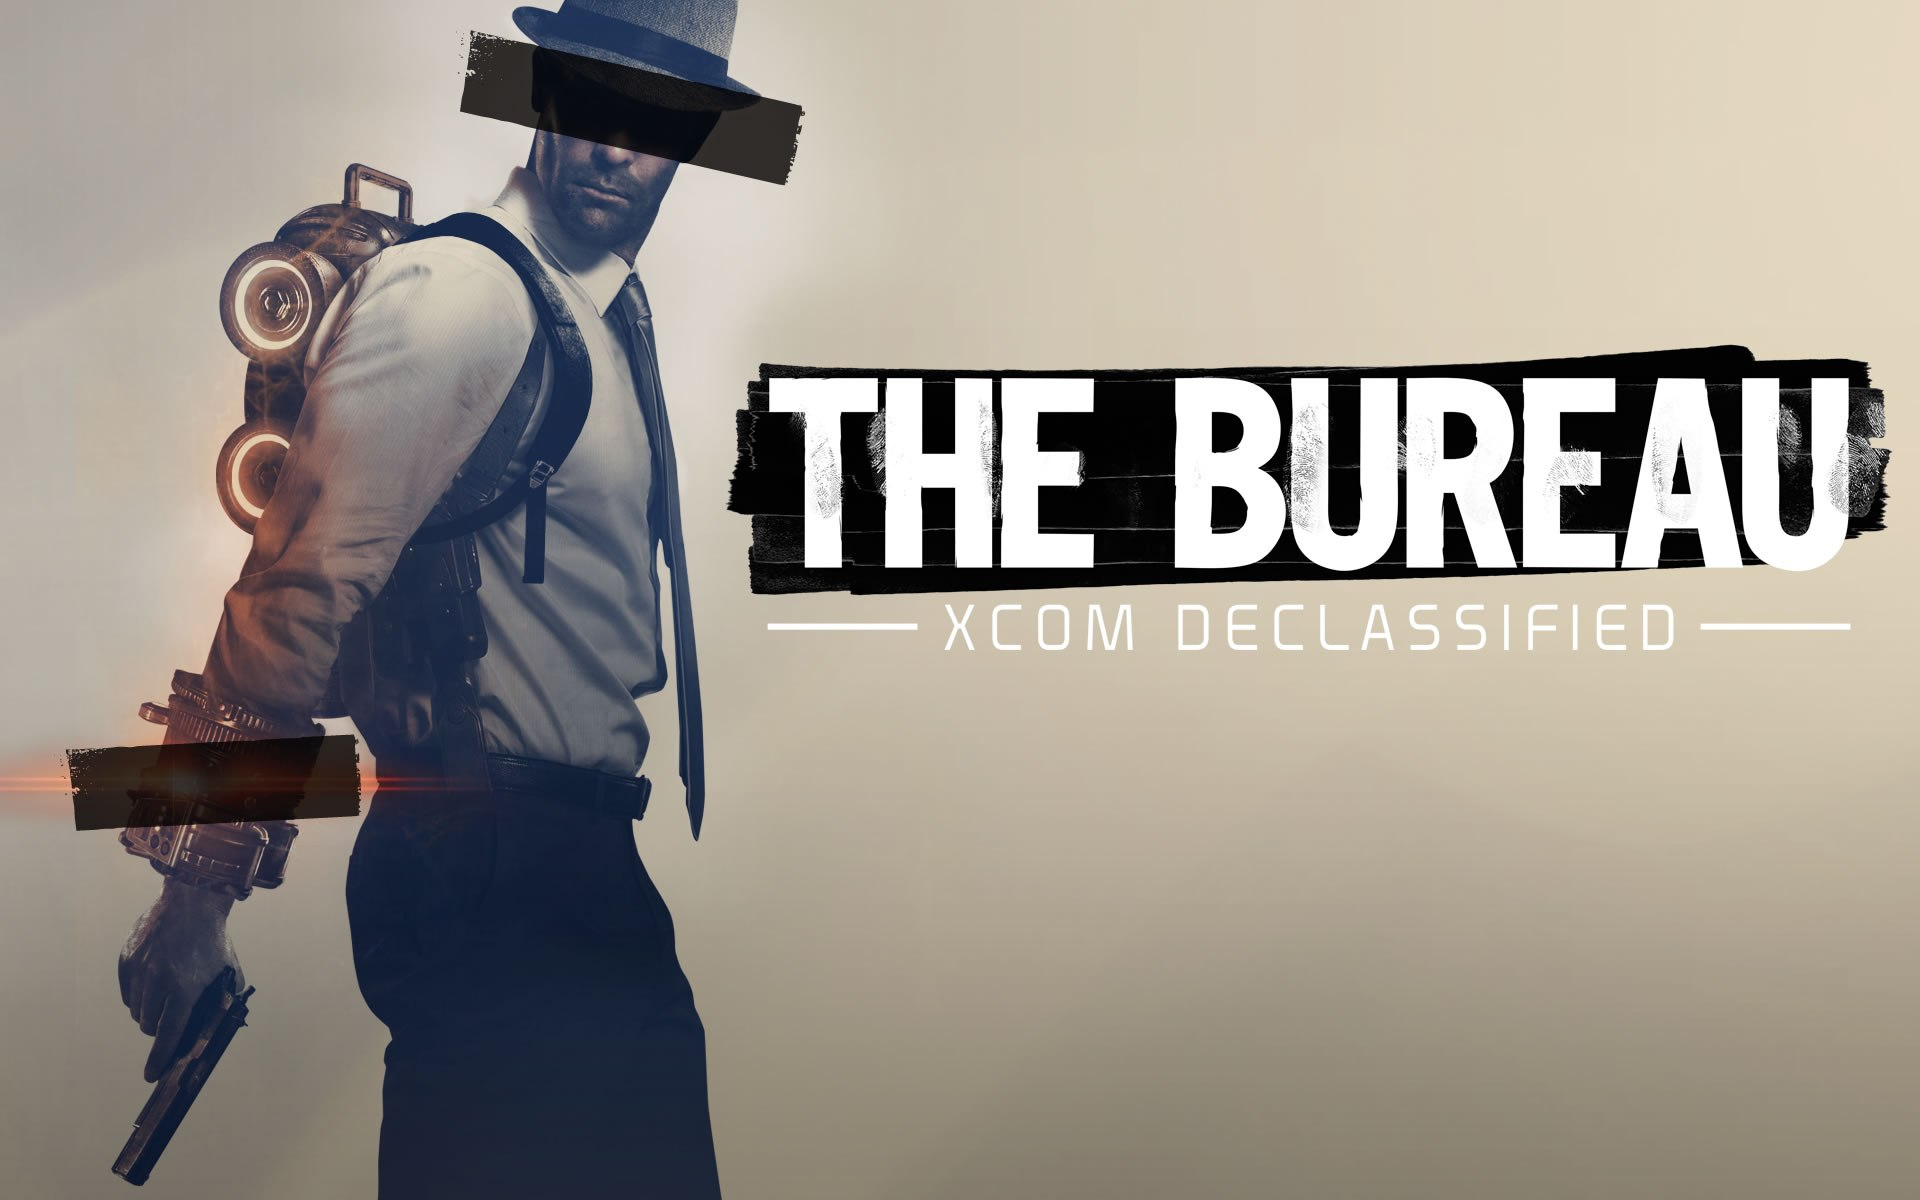 the bureau xcom declassified wide تاریخ انتشار دقیق برخی از بازی های سال 2013